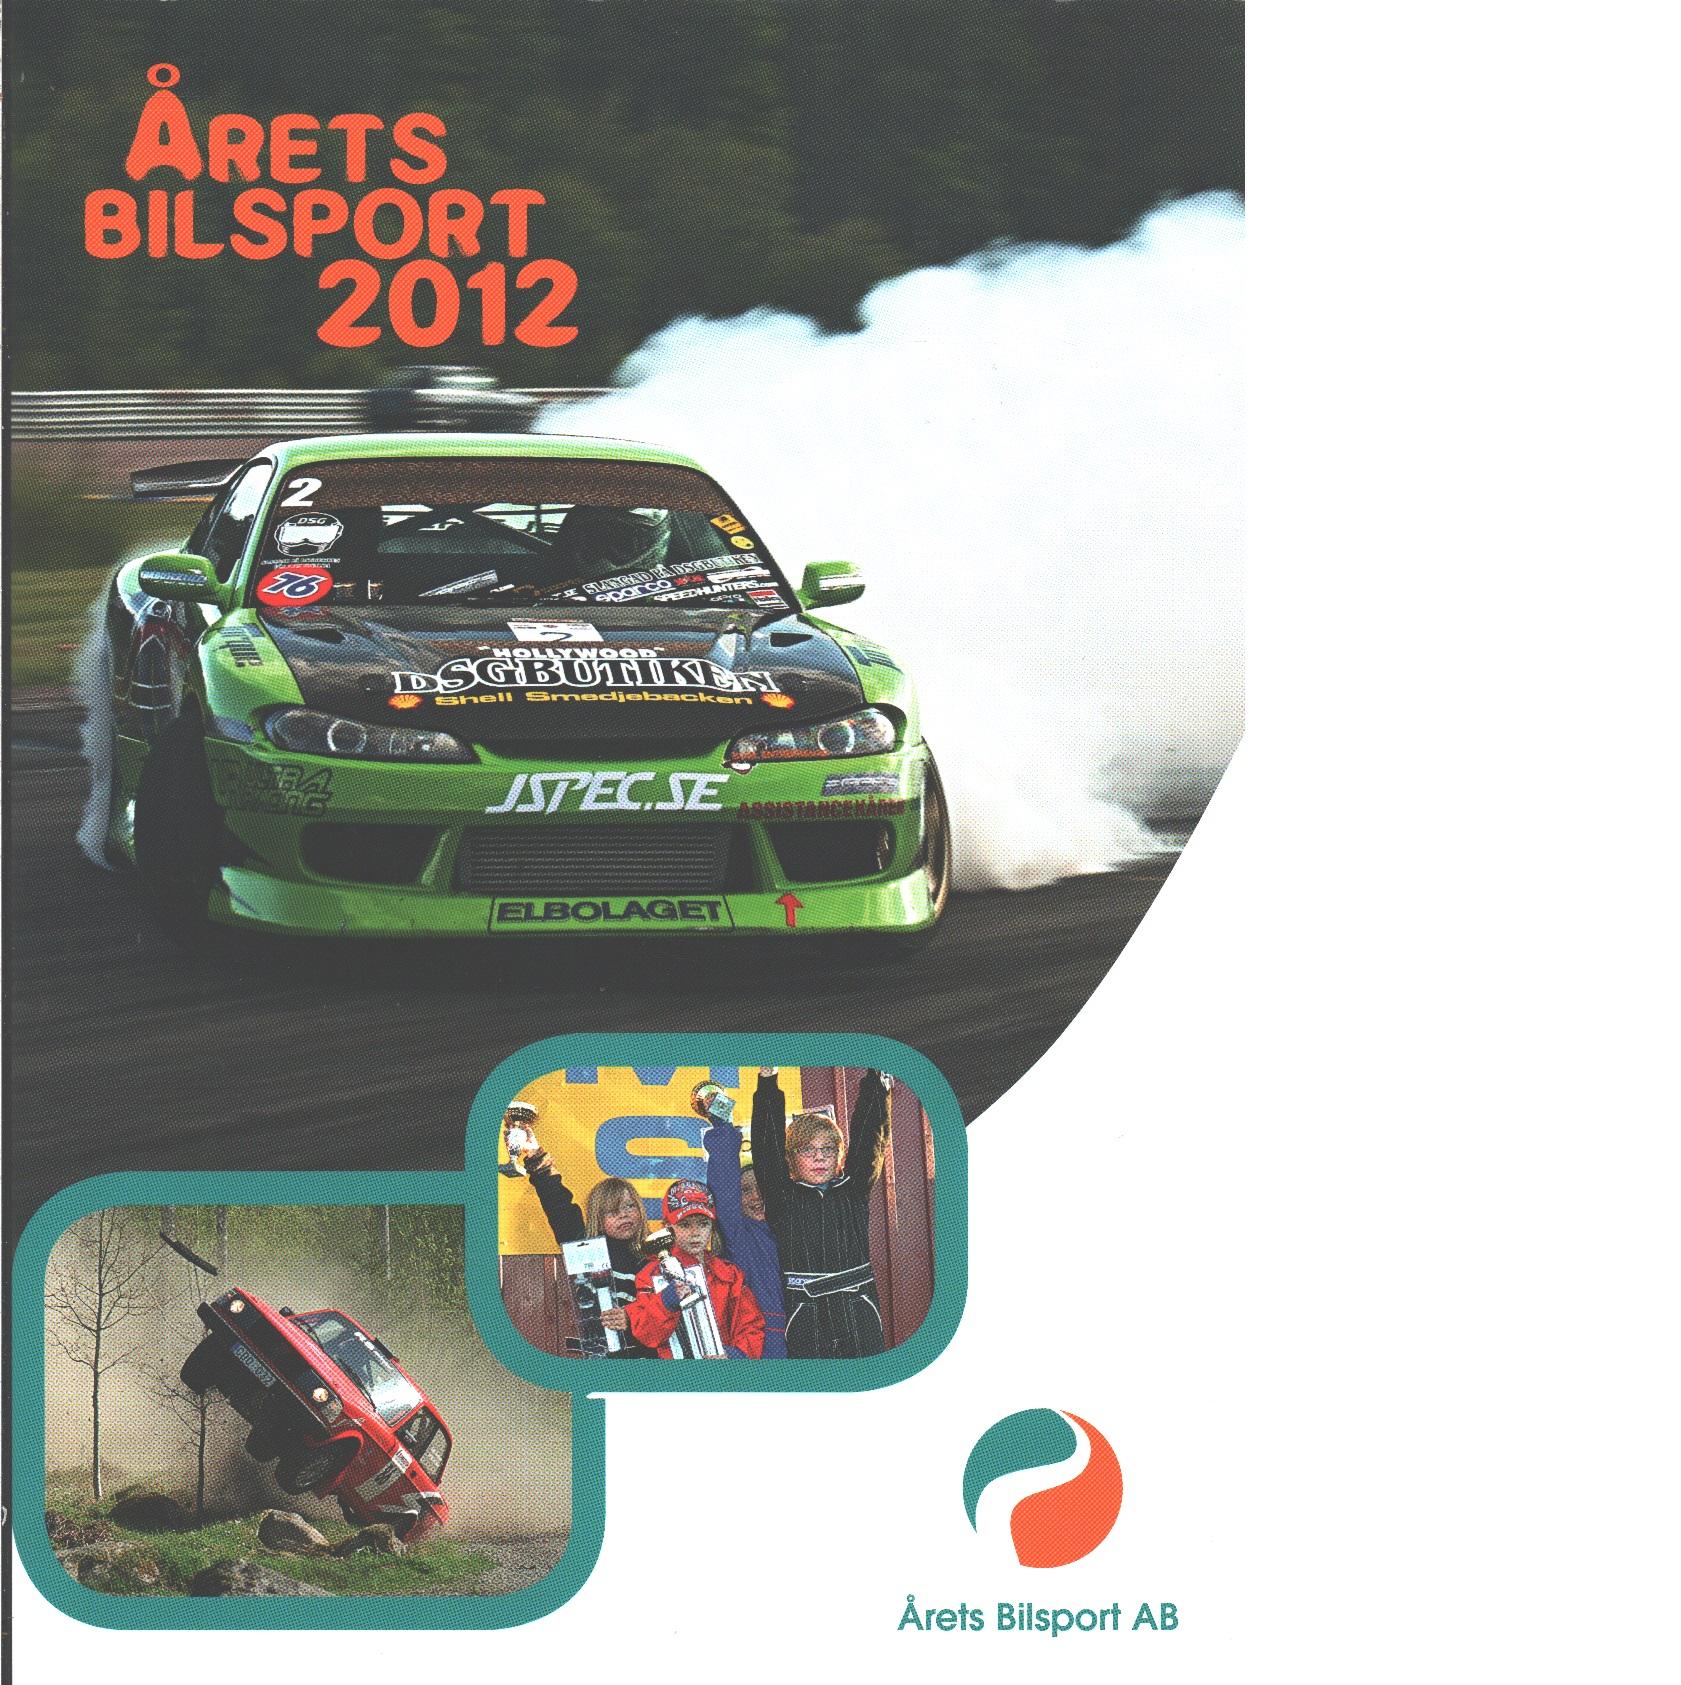 Årets bilsport 2012 - Annemo Friberg